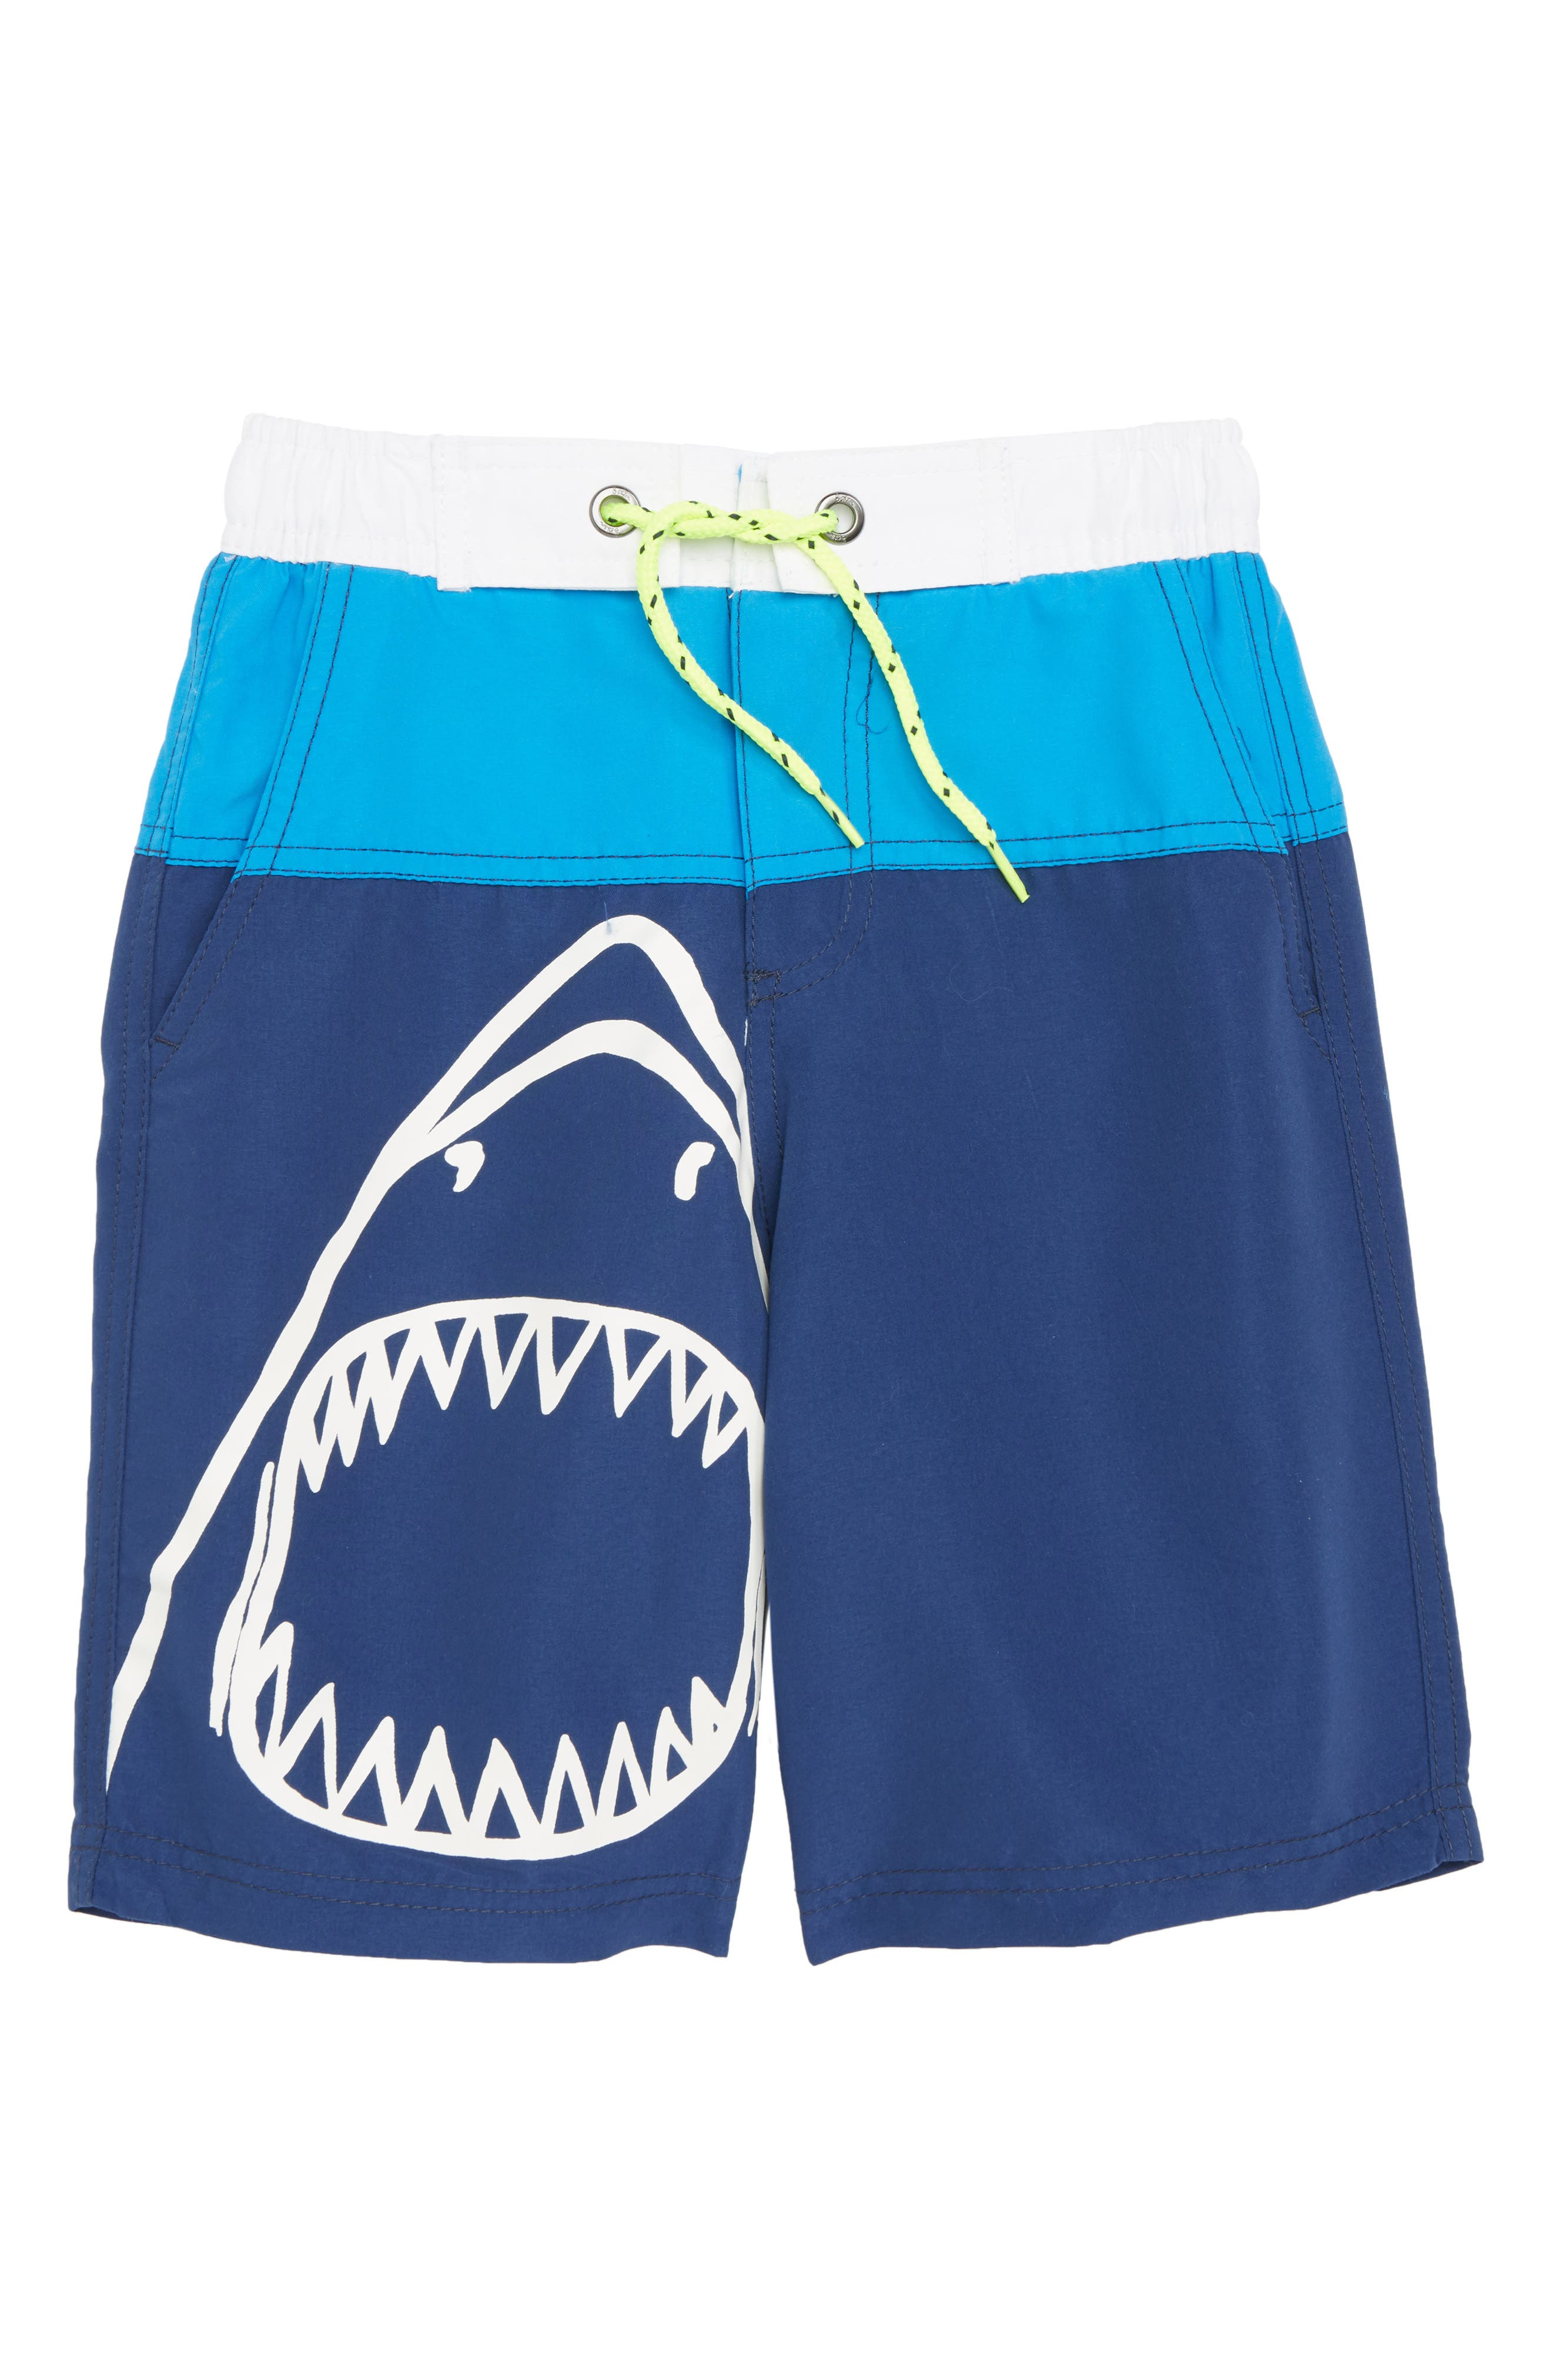 Alternate Image 1 Selected - Mini Boden Shark Board Shorts (Little Boys & Big Boys)